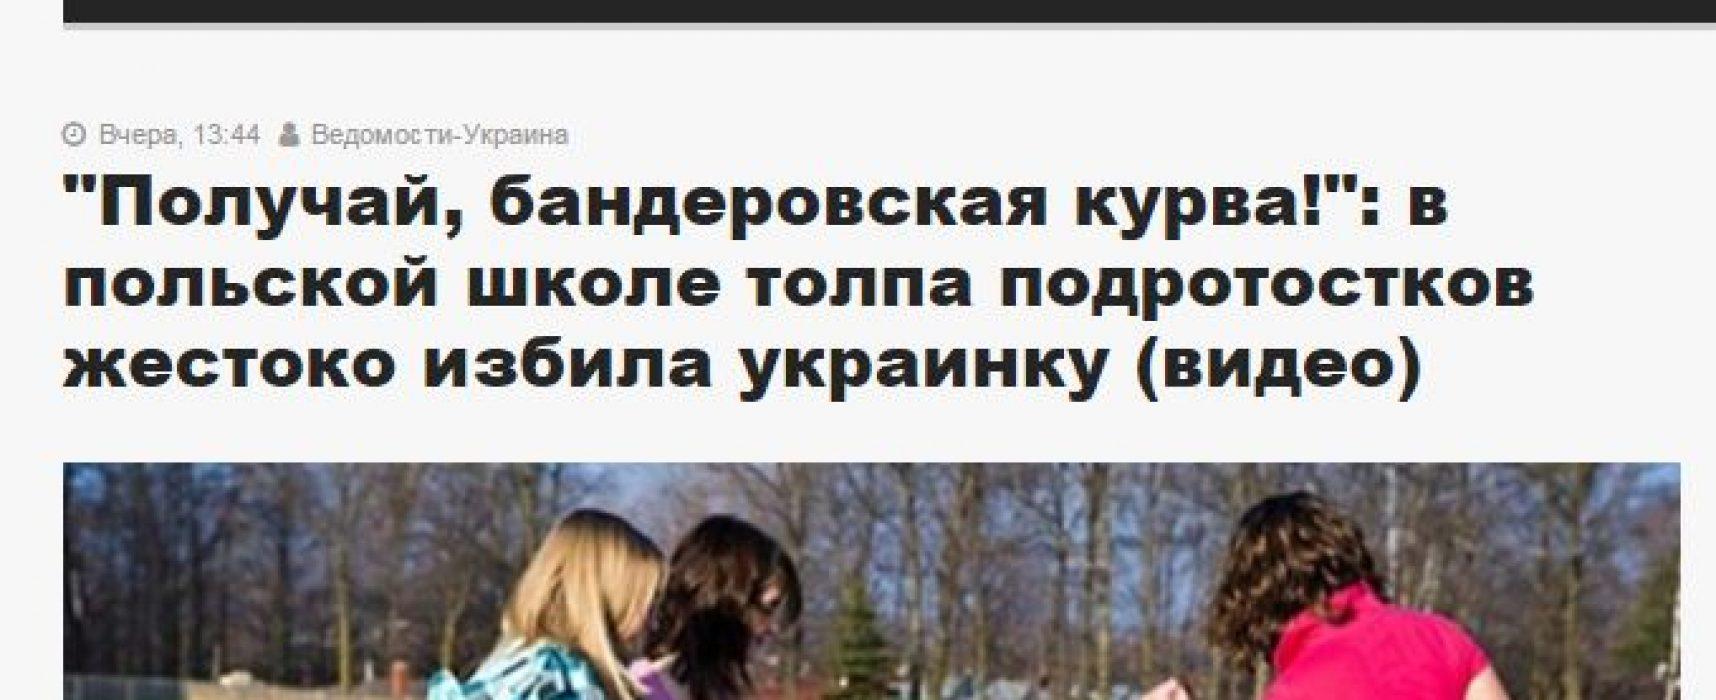 Fake: Polish Students Attack Ukrainian Schoolgirl